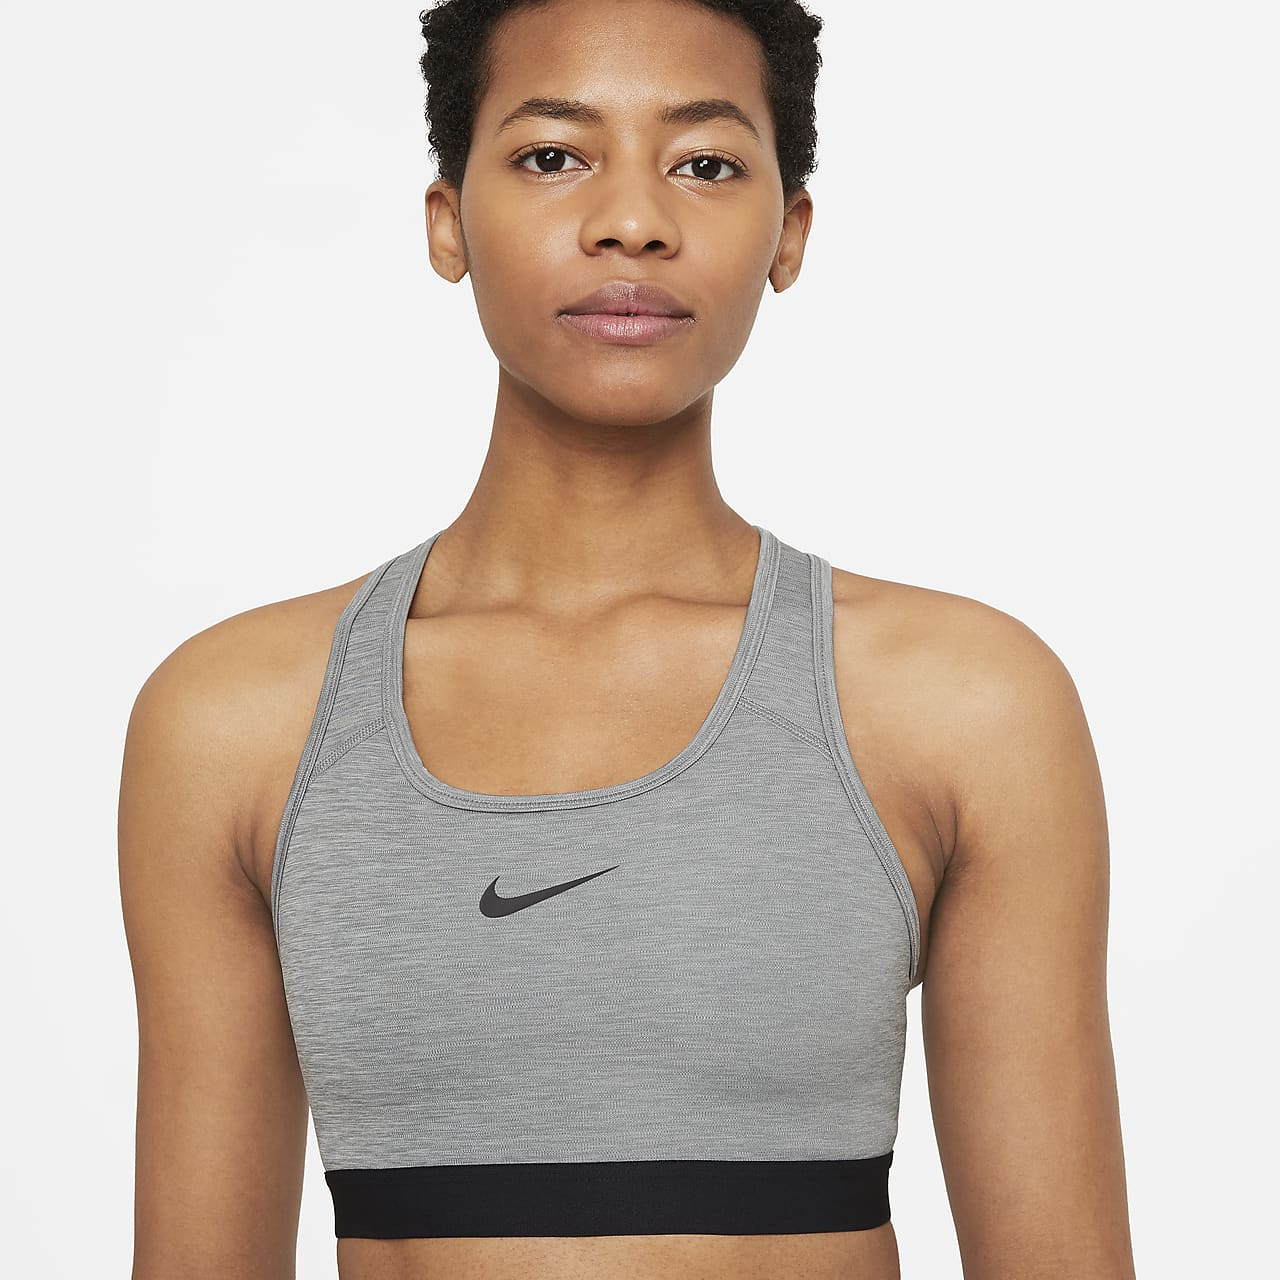 Nike Swoosh Women's Medium-Support 1-Piece Pad Sports Bra BV3902-084